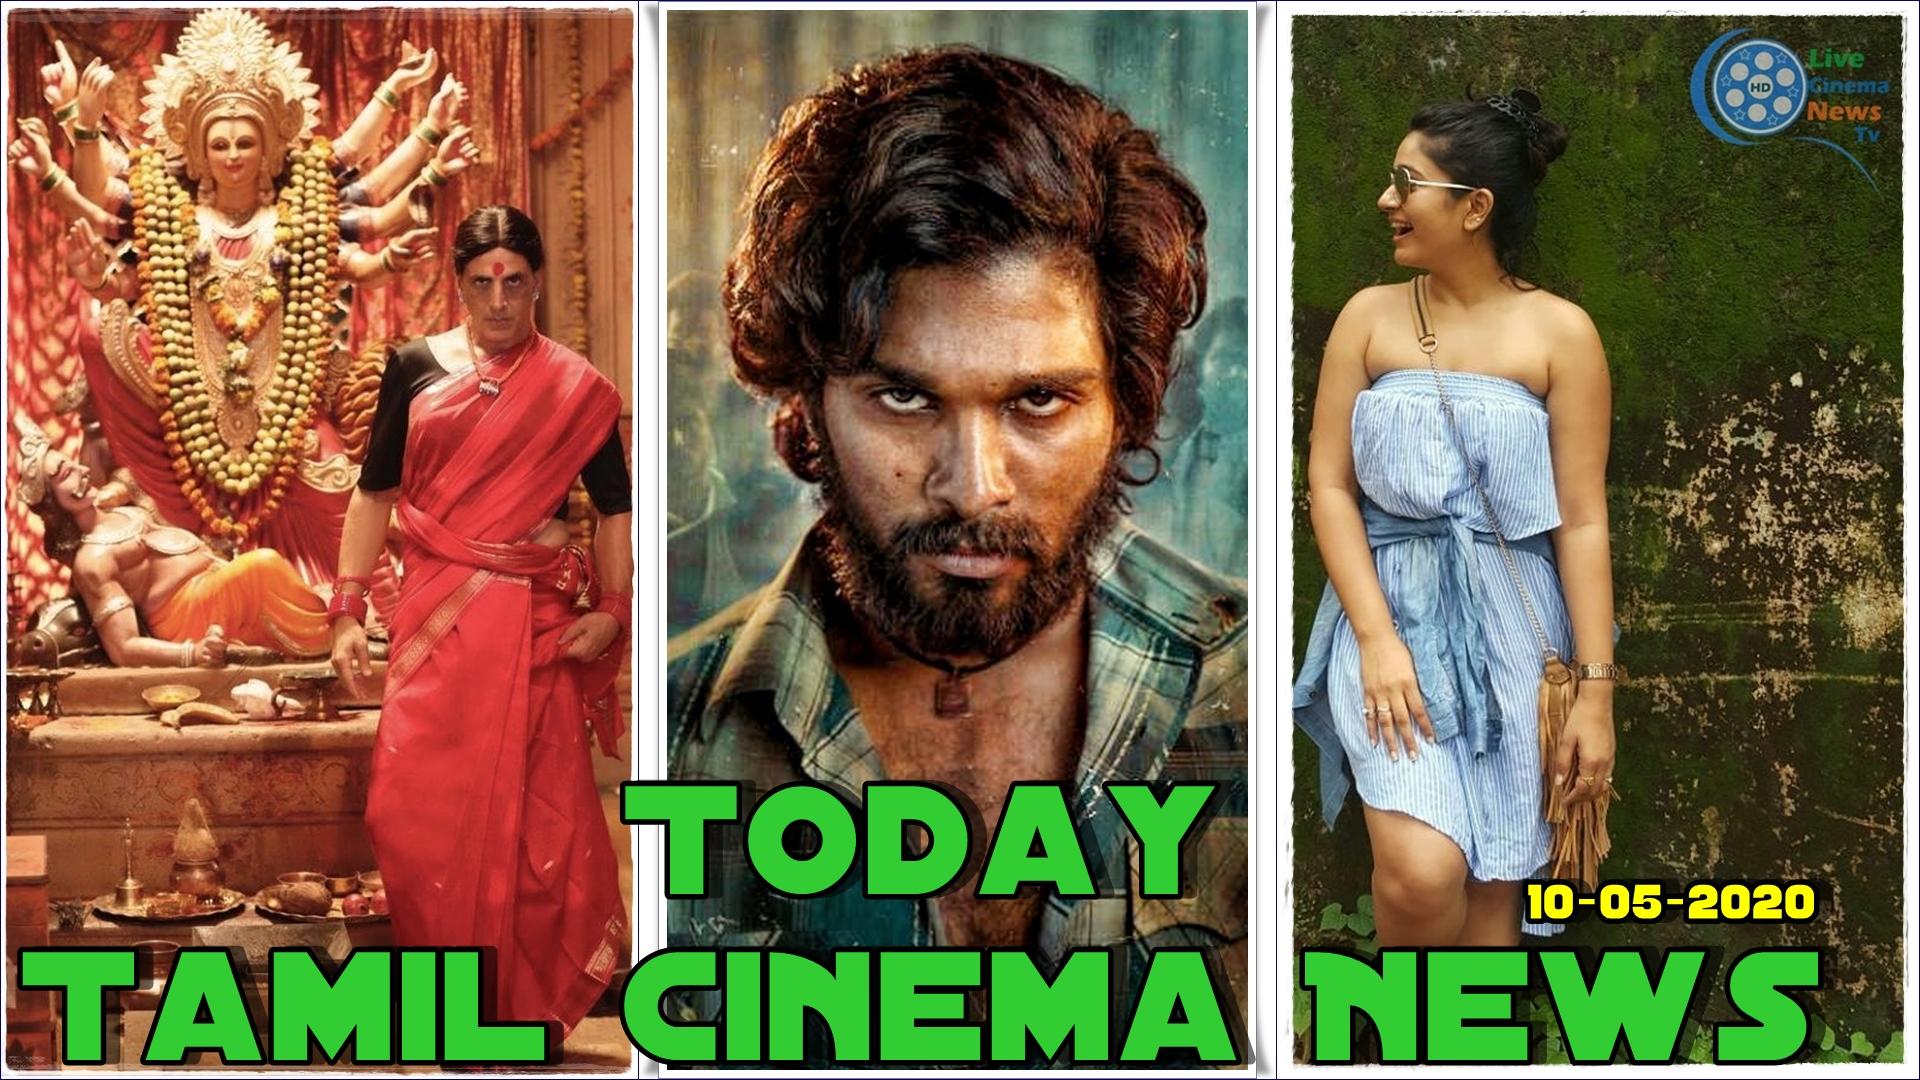 Today Tamil Cinema News 10-05-2020